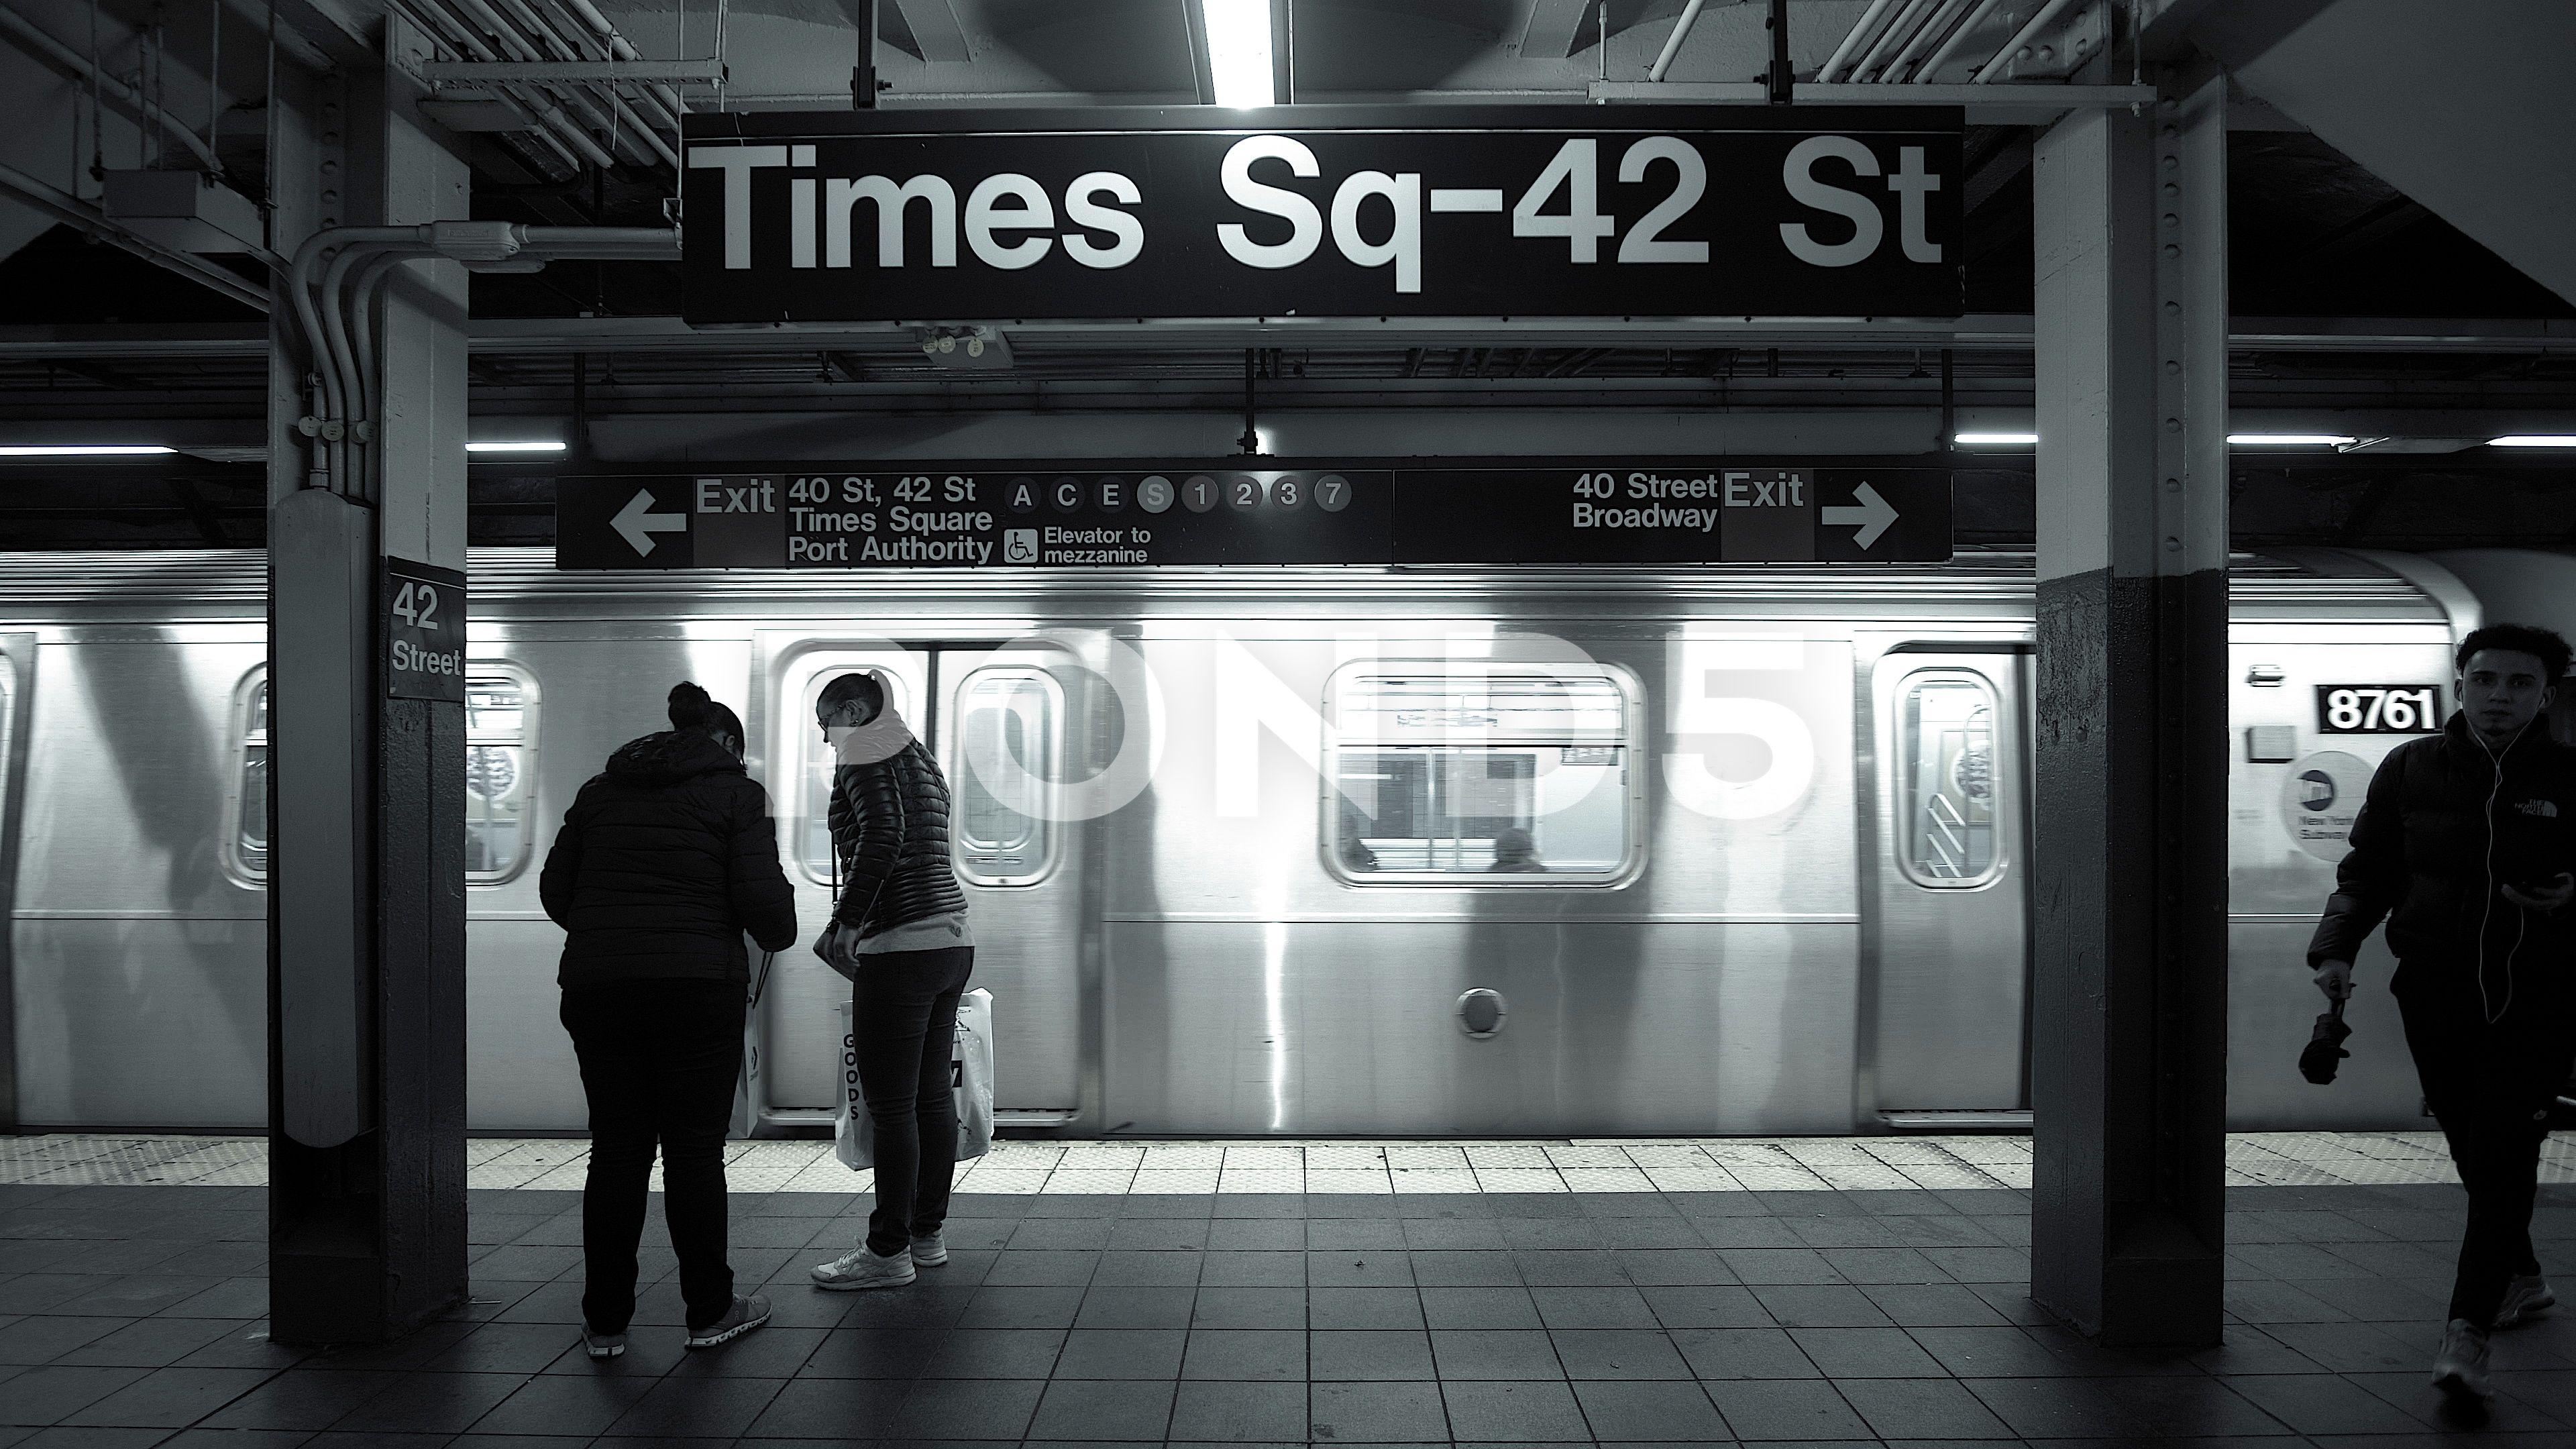 Times Sq 42 St New York Ny